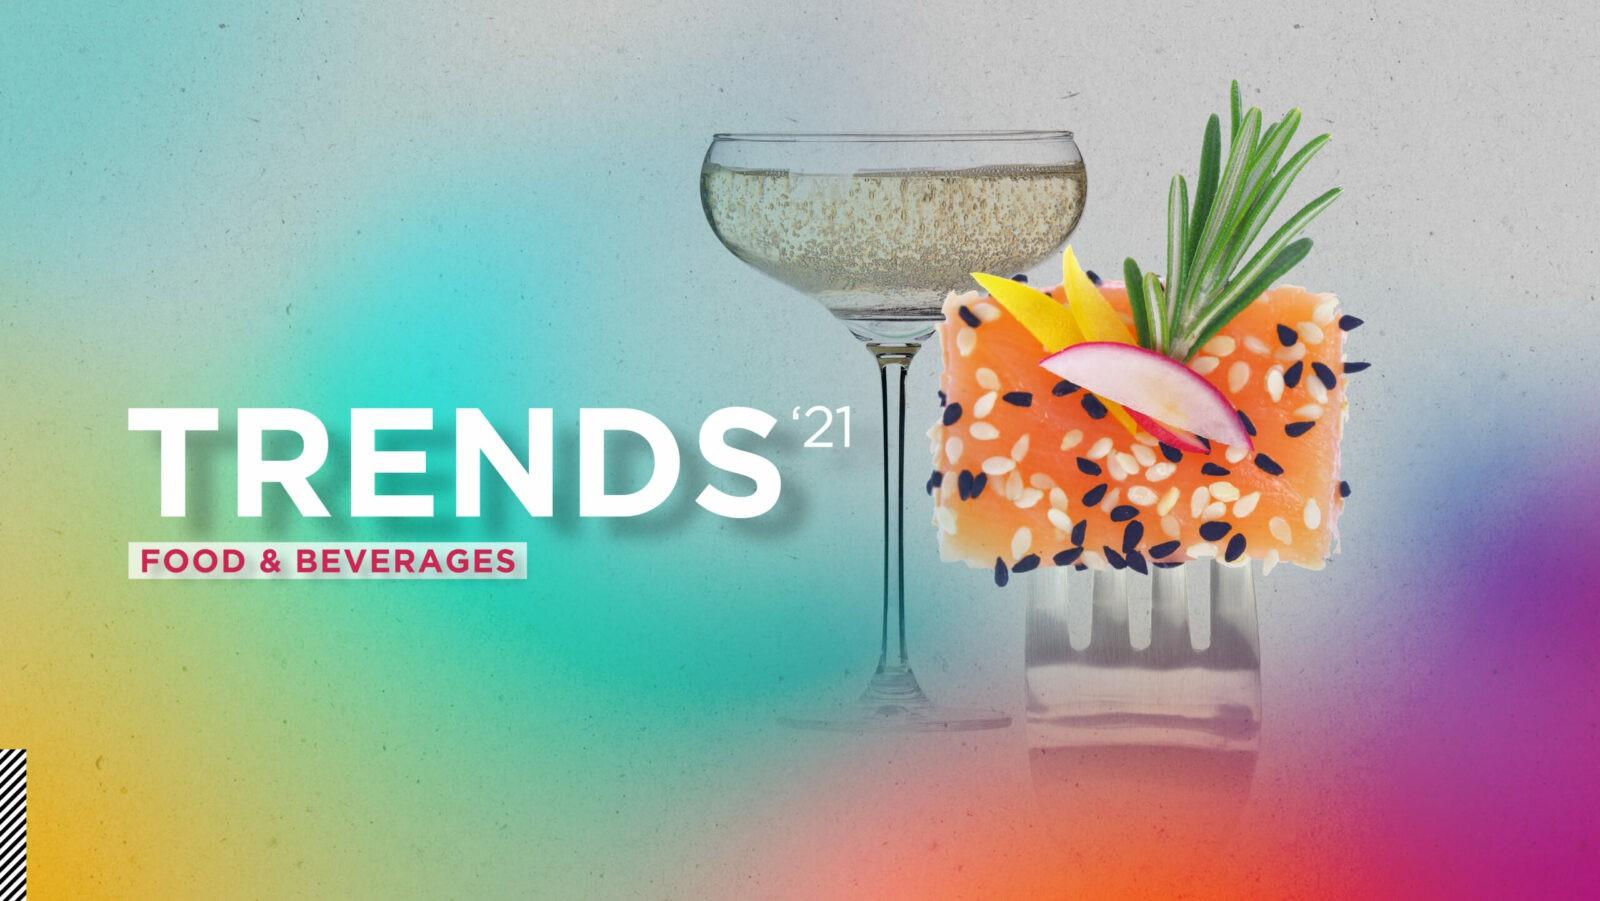 Trends 2021 - Food & Beverages